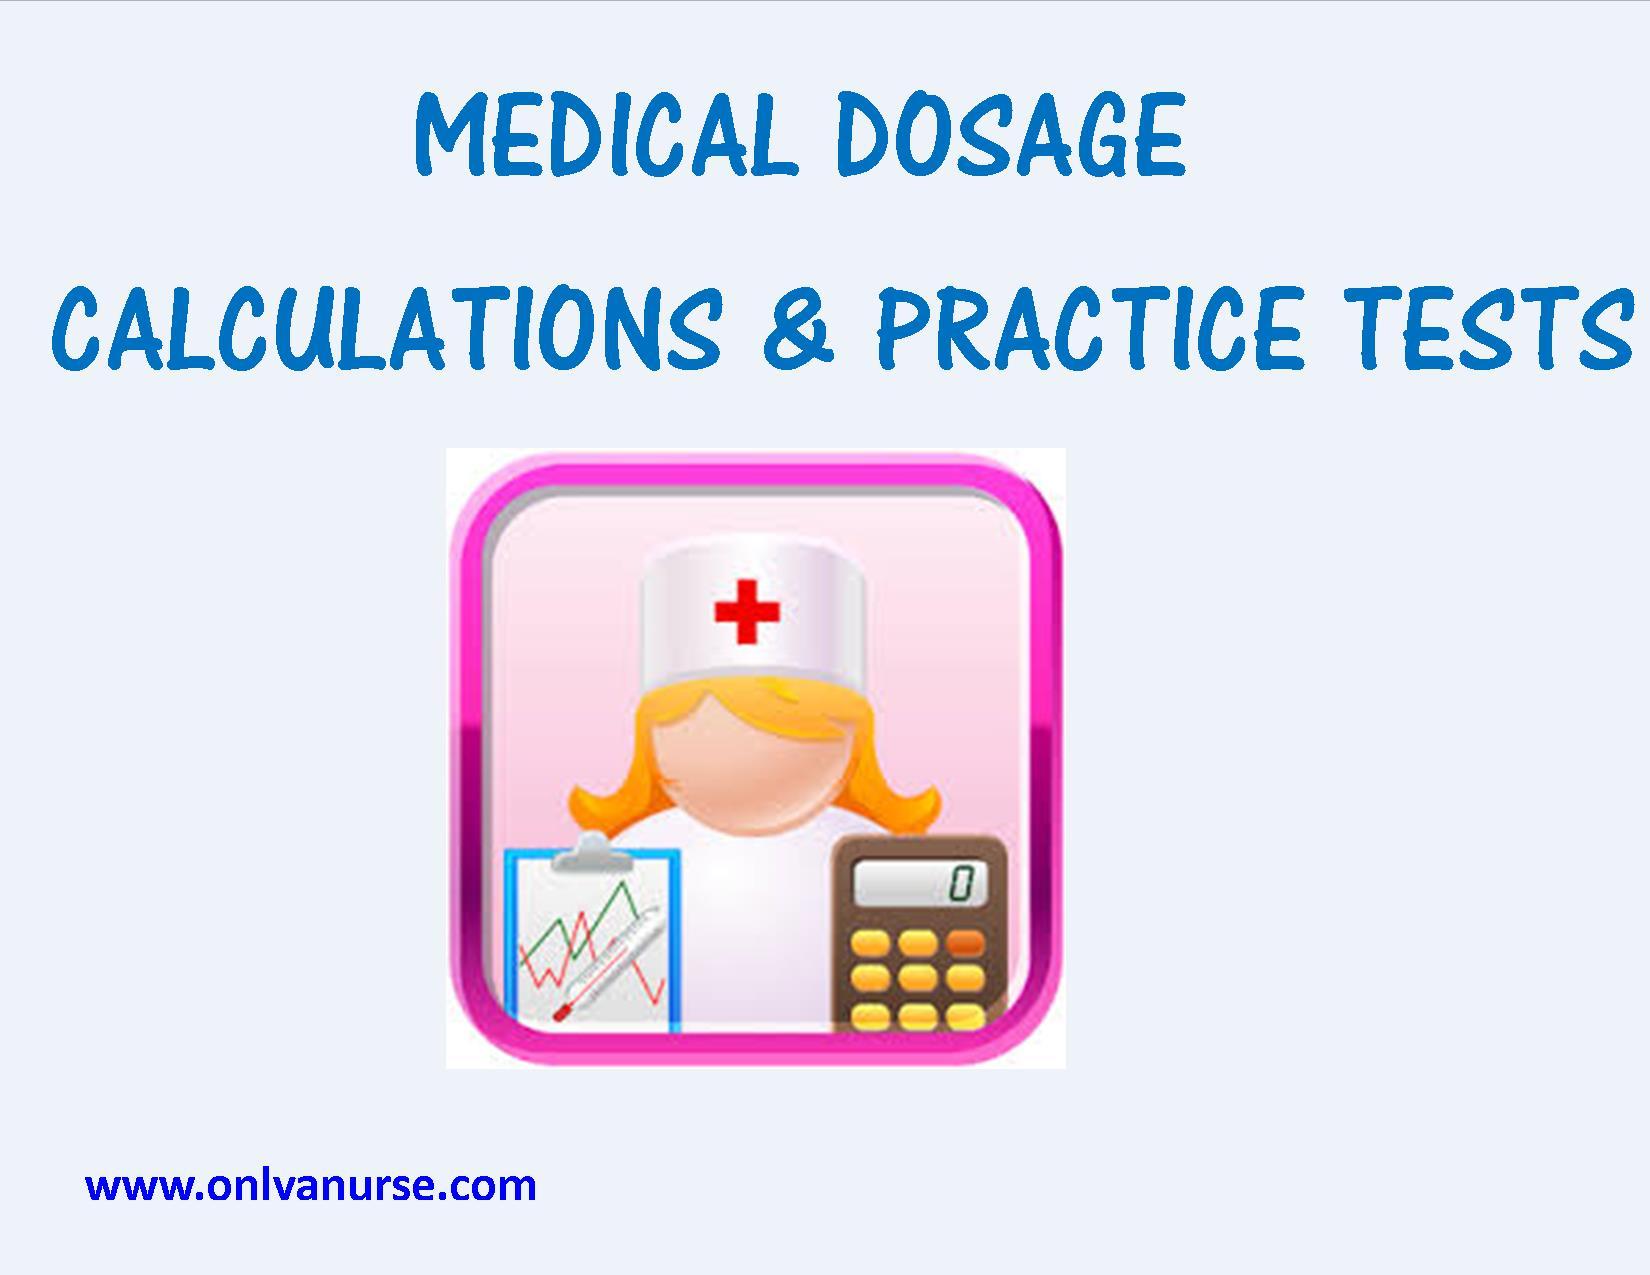 nursing calculation and practice, practice dosage calculation, tests for nurses, nursing dosage calc, medical dosage calculation